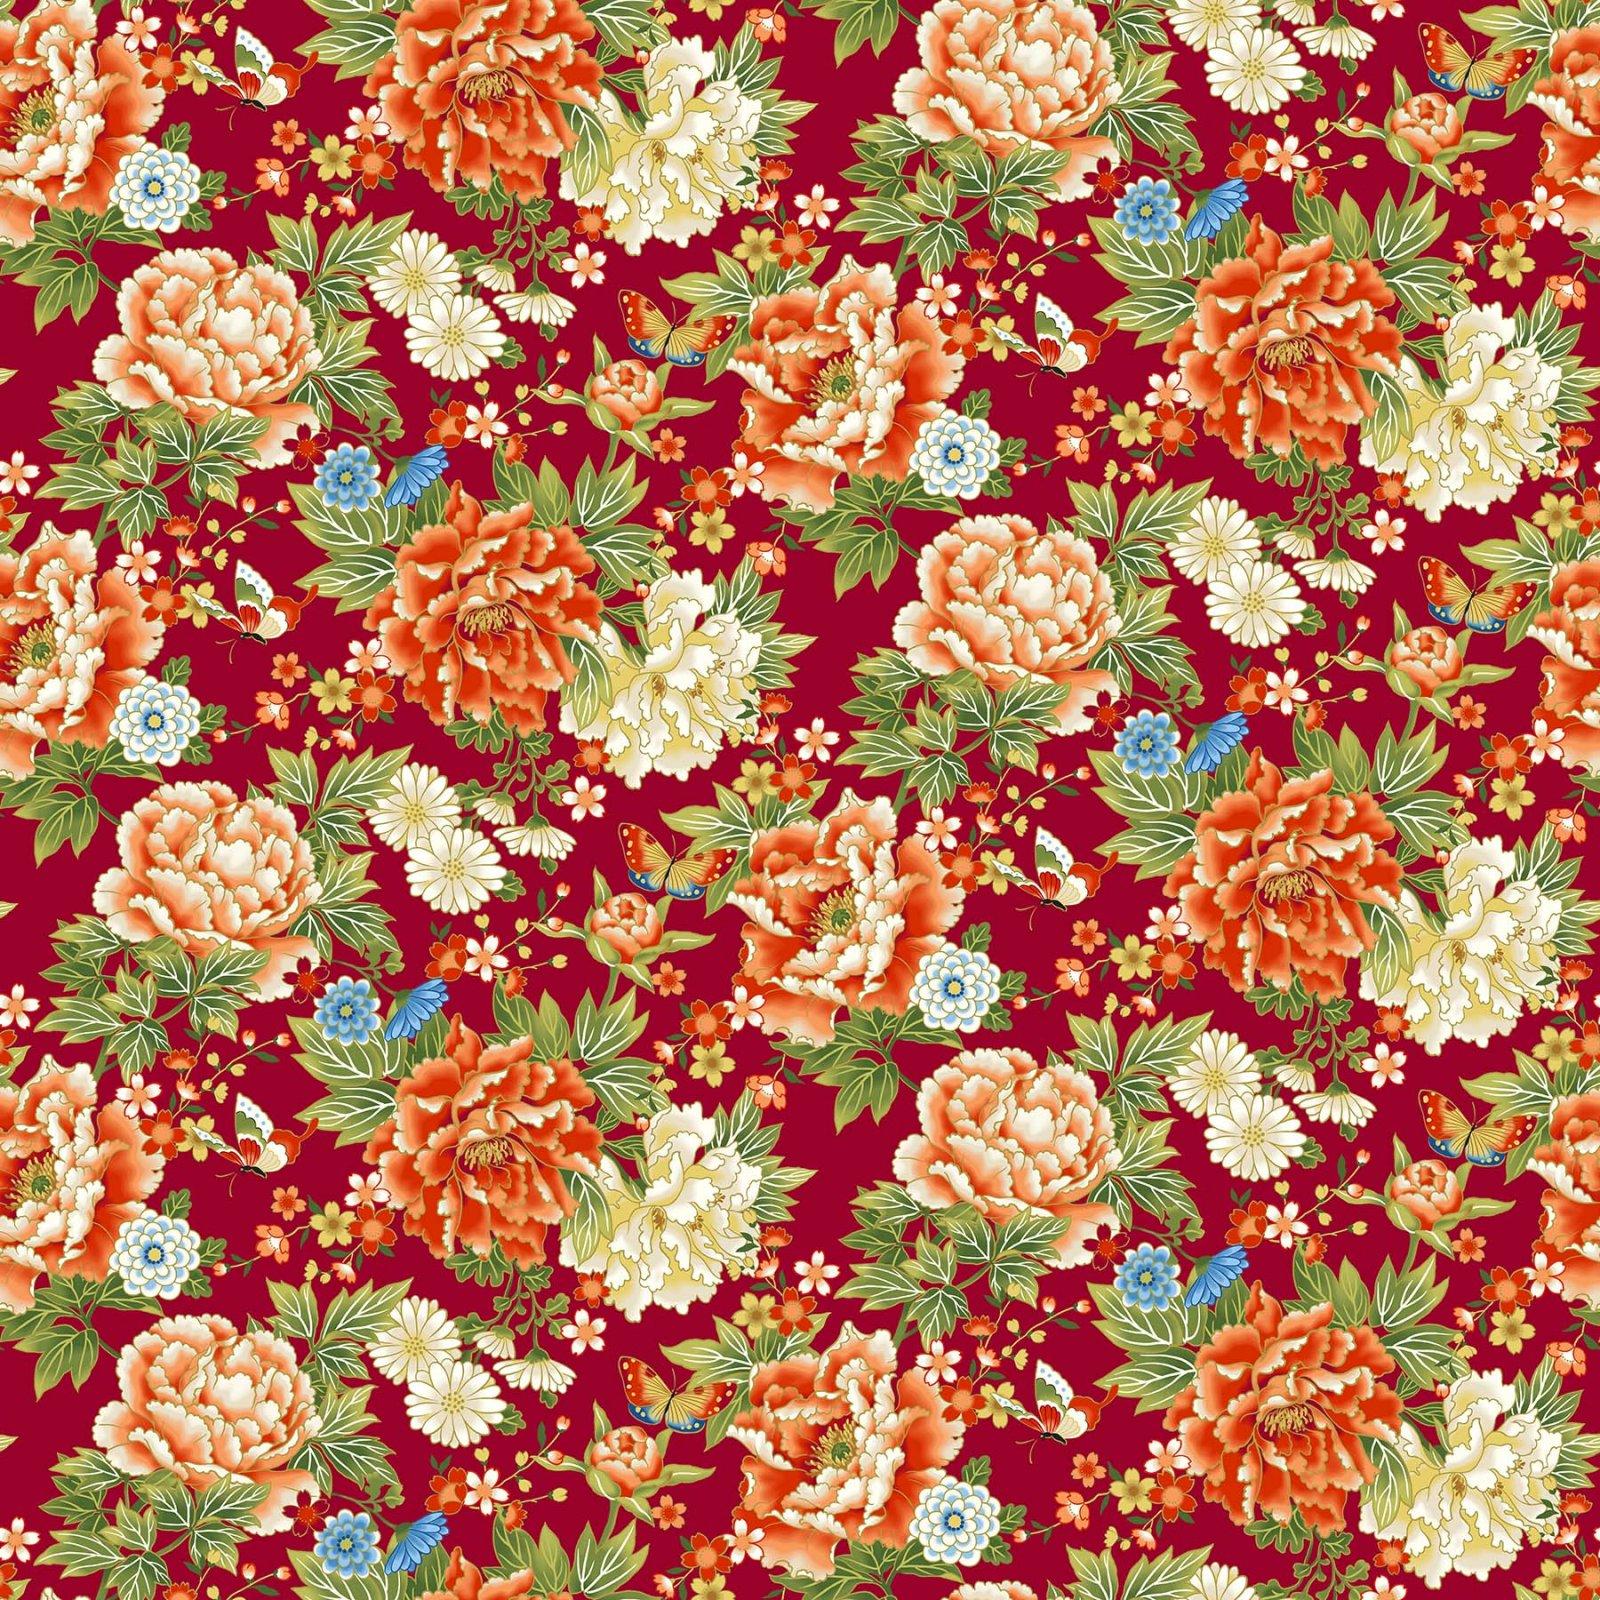 Northcott -Kyoto Garden23270M 24 Red MultiKyoto Floral